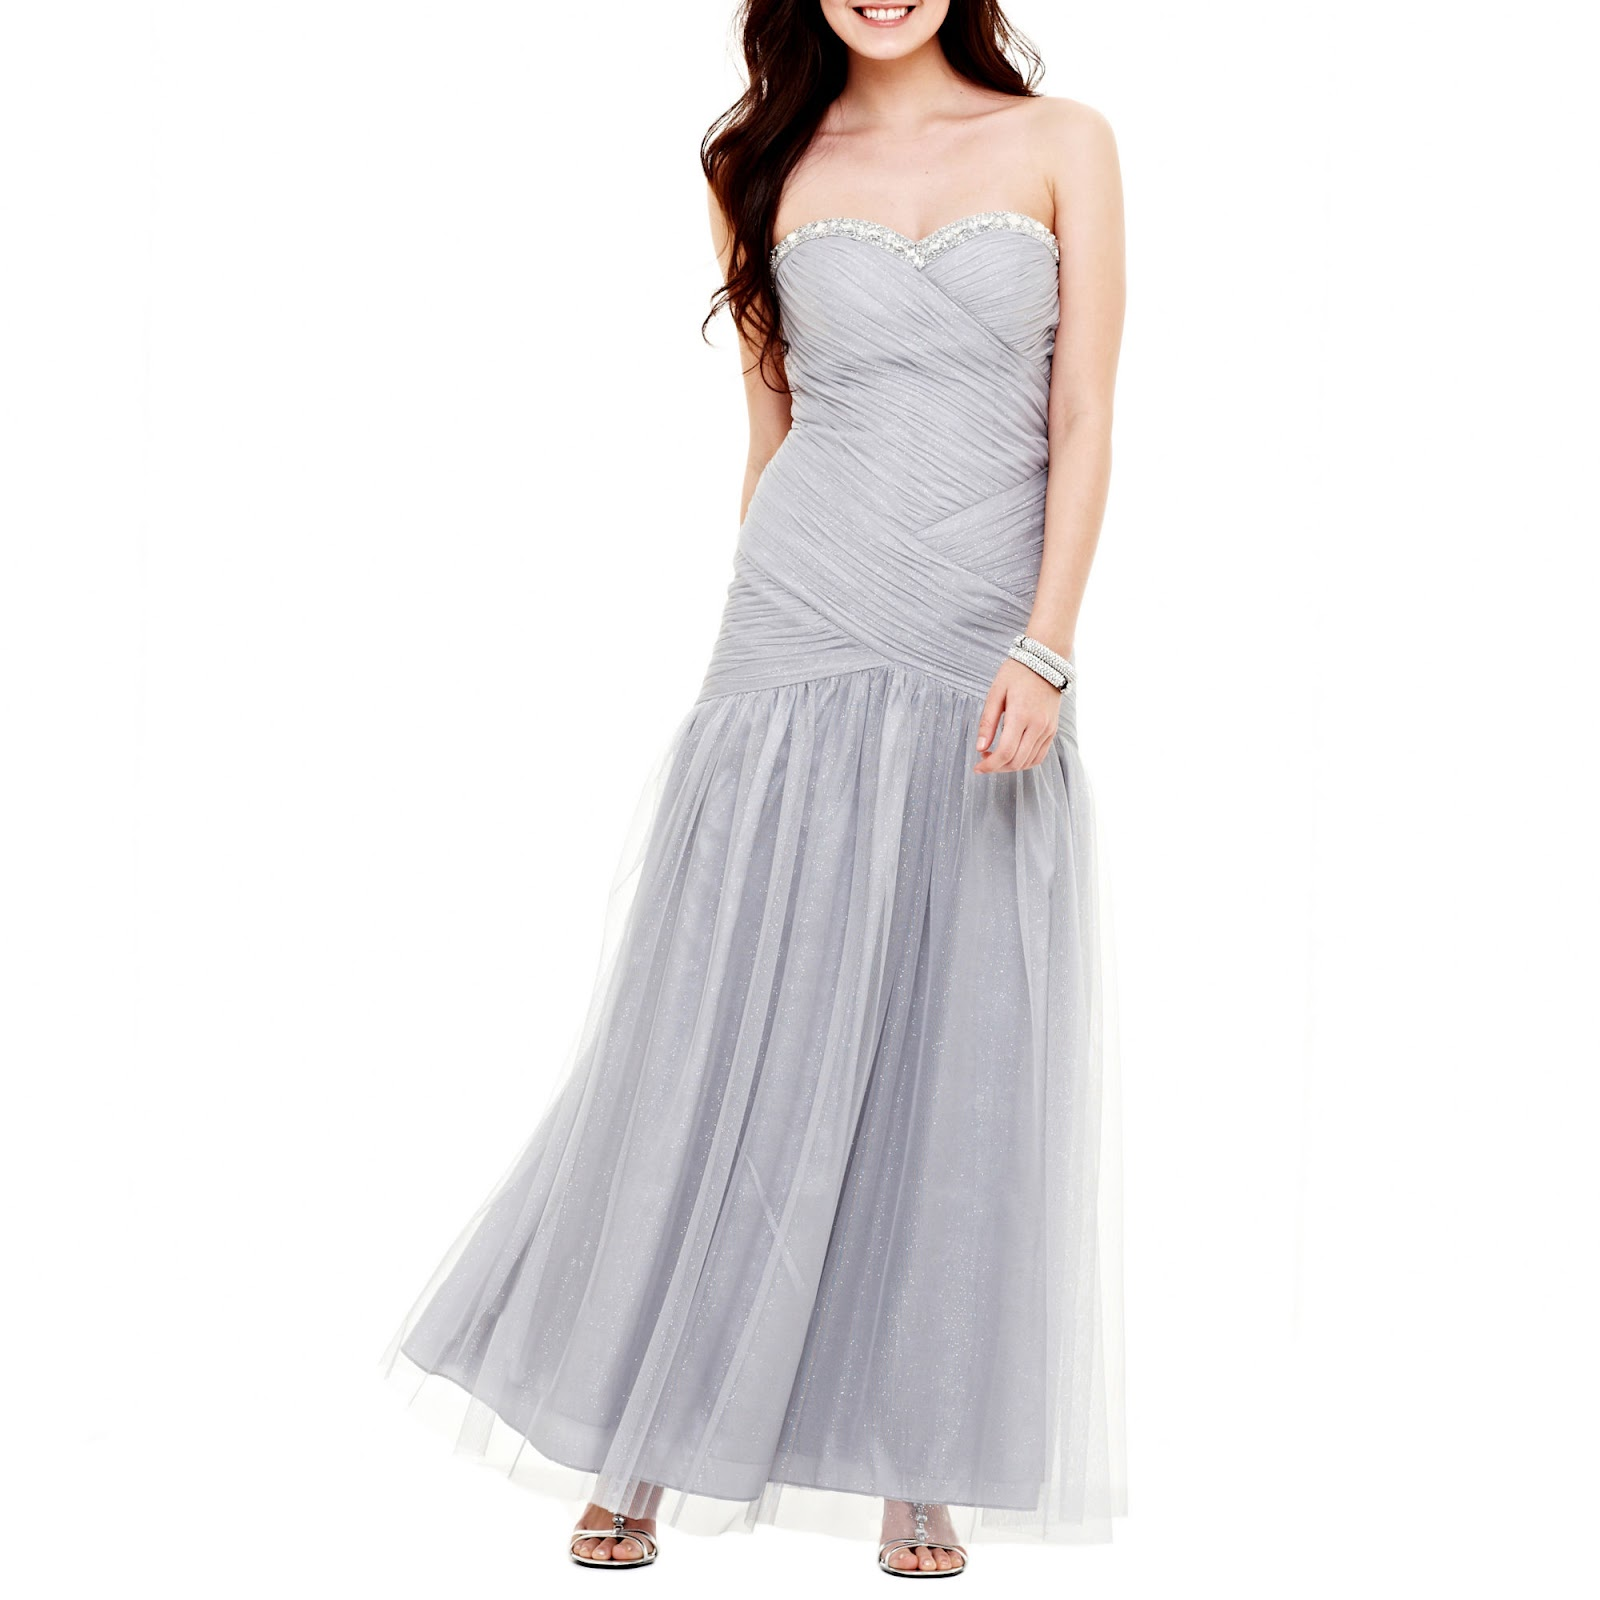 Jc Penny Prom Dresses - Formal Dresses